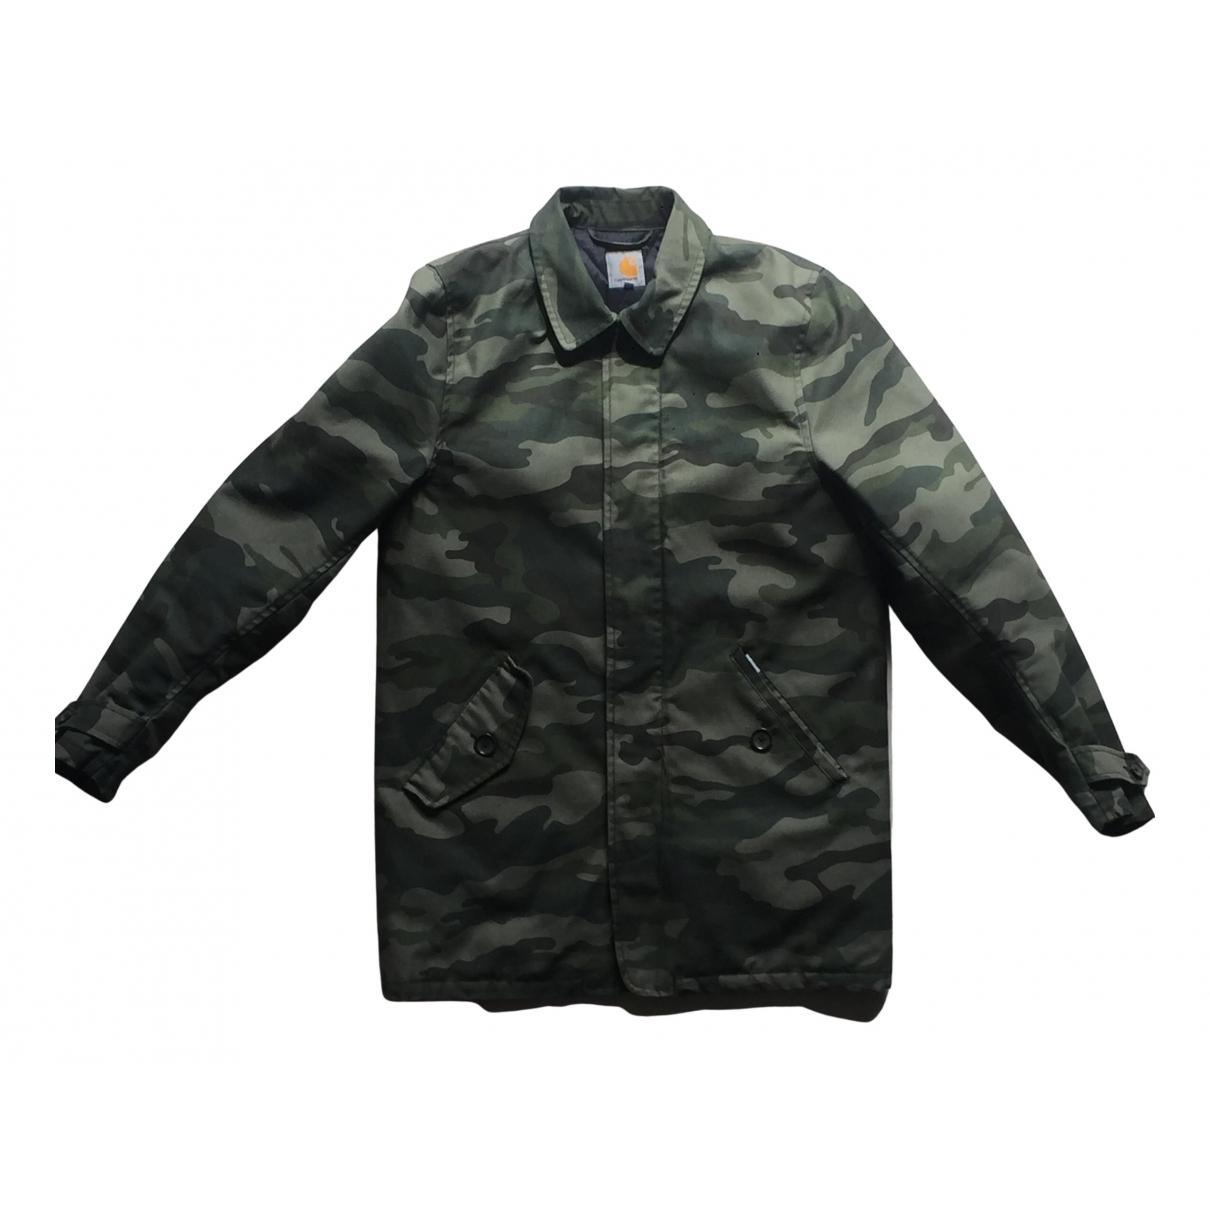 Carhartt Wip - Manteau   pour homme - vert